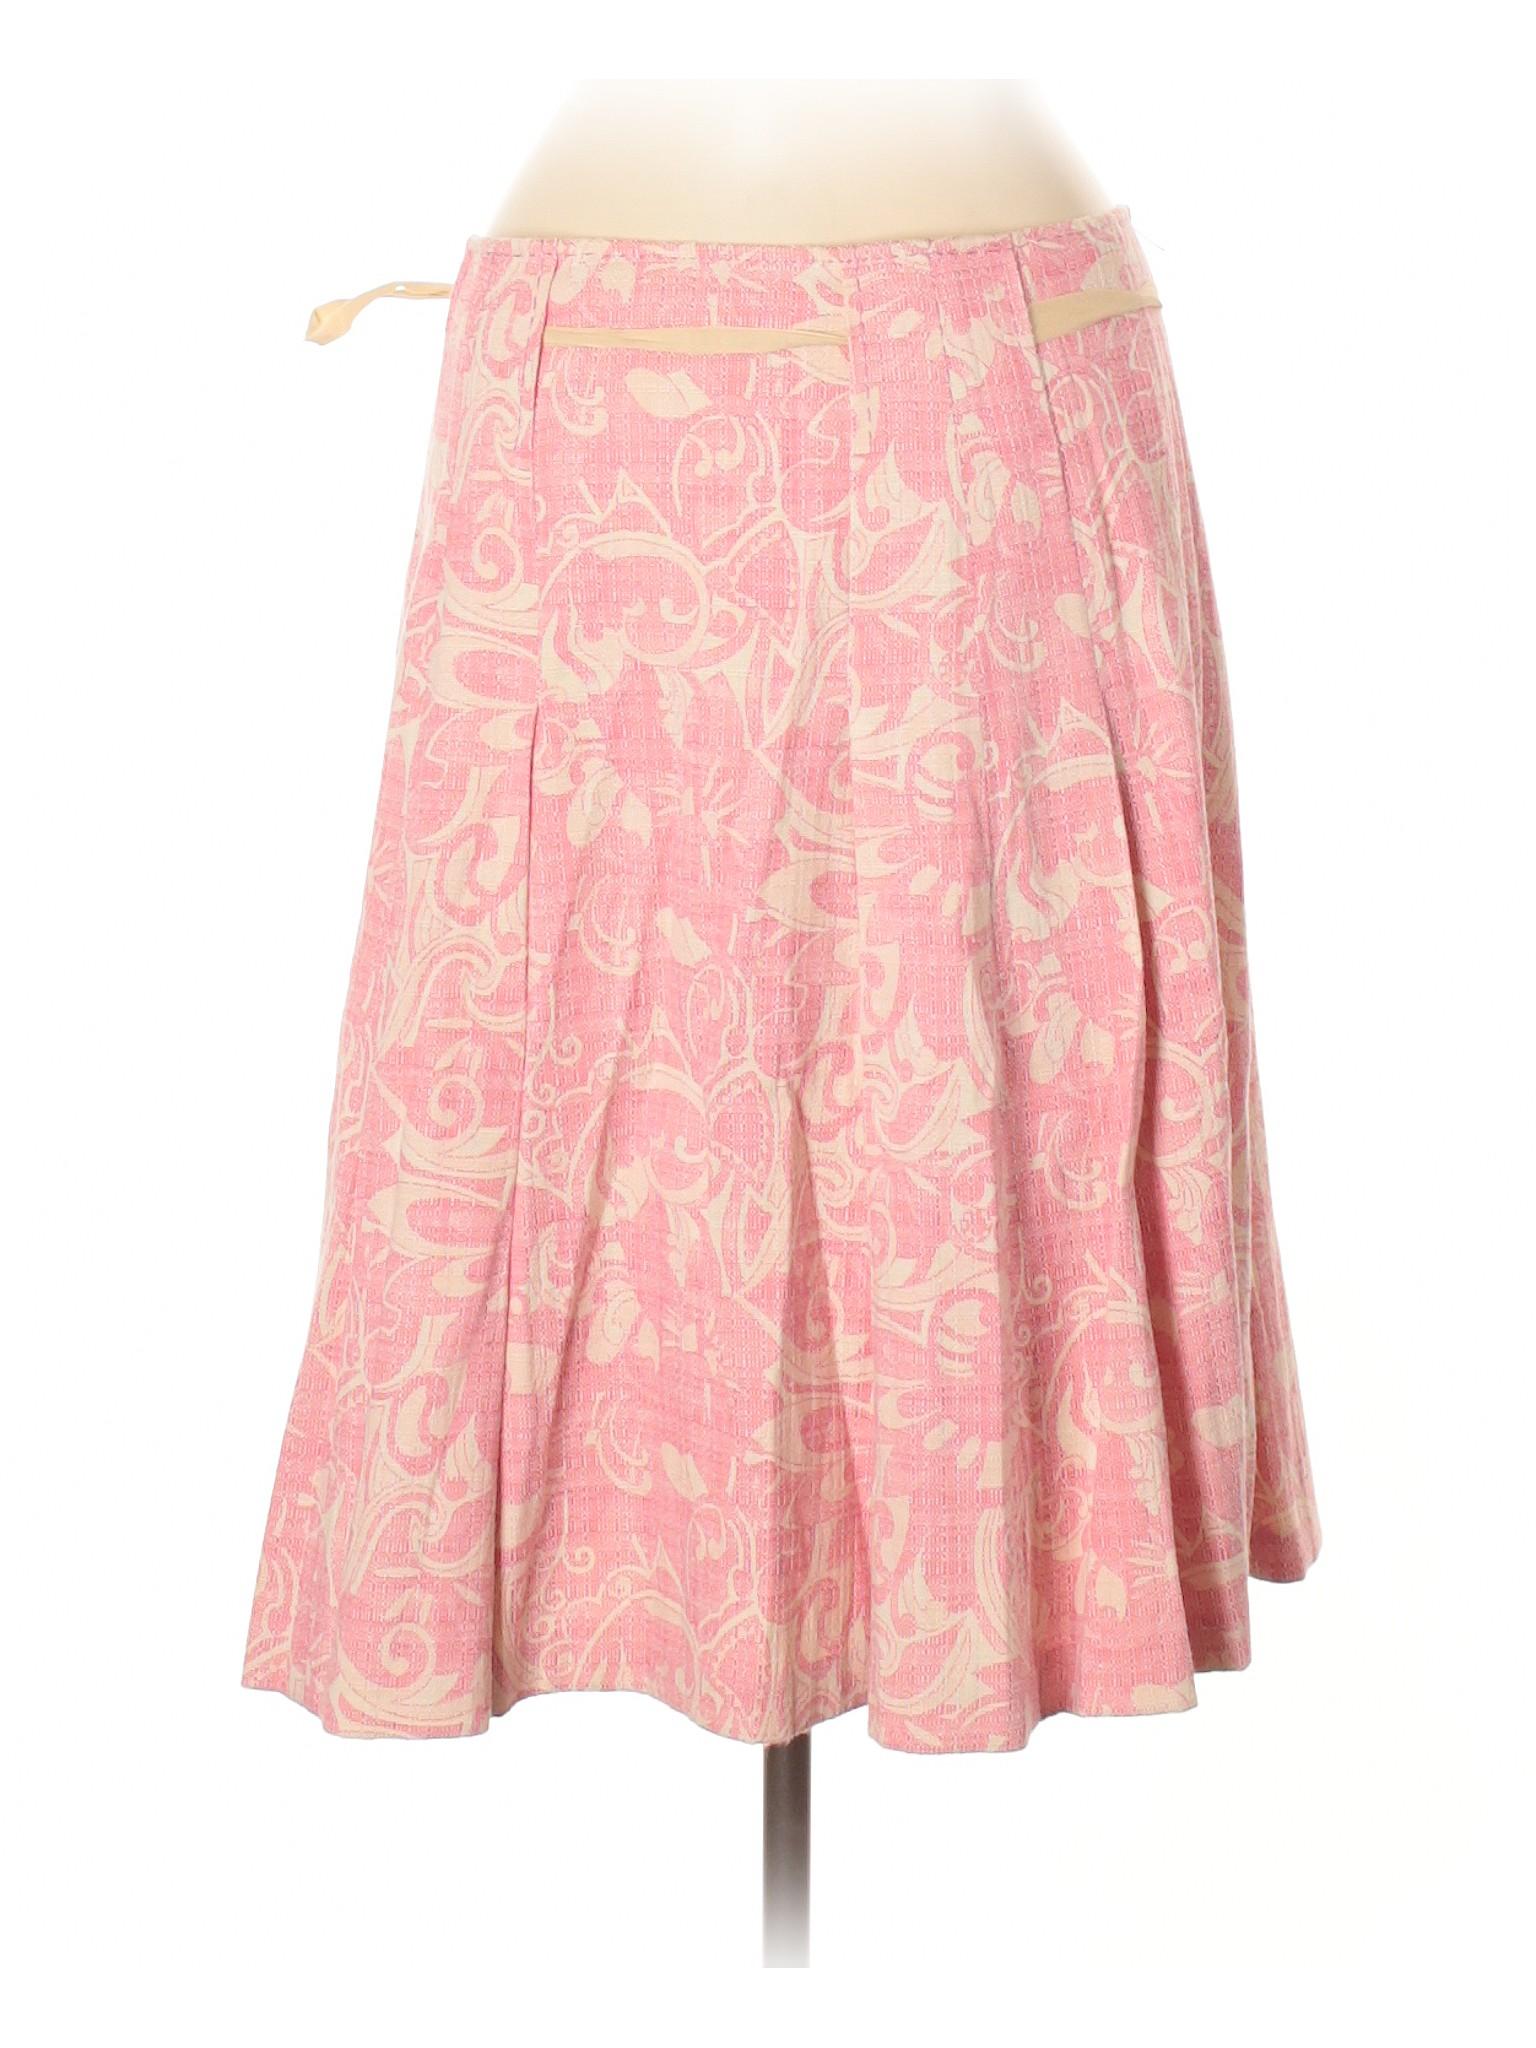 Elie Casual Boutique Skirt leisure Tahari 1xw67Rq